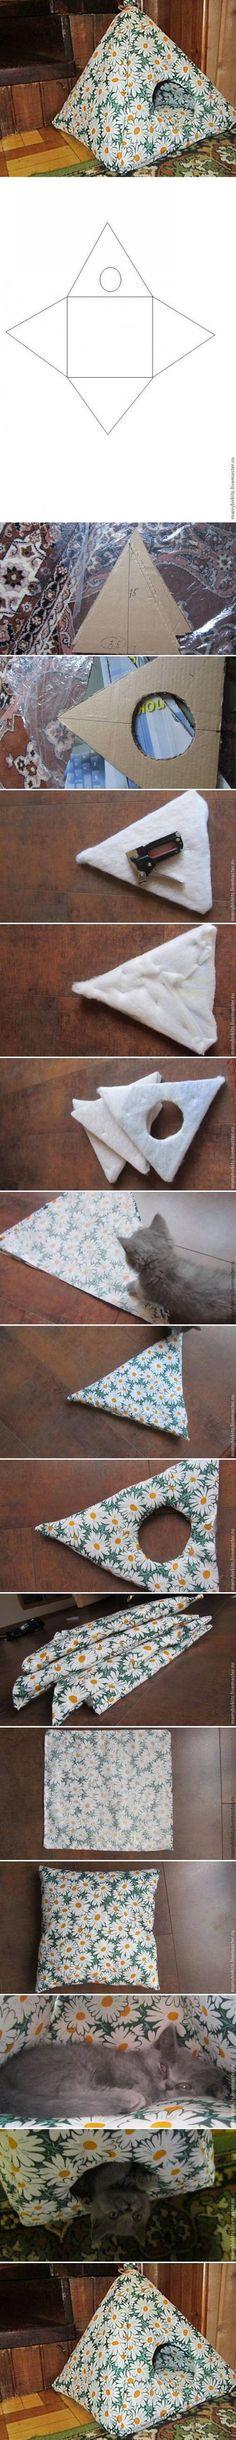 Katzenhöhle selber nähen... DIY House for Cat DIY Projects | UsefulDIY.com